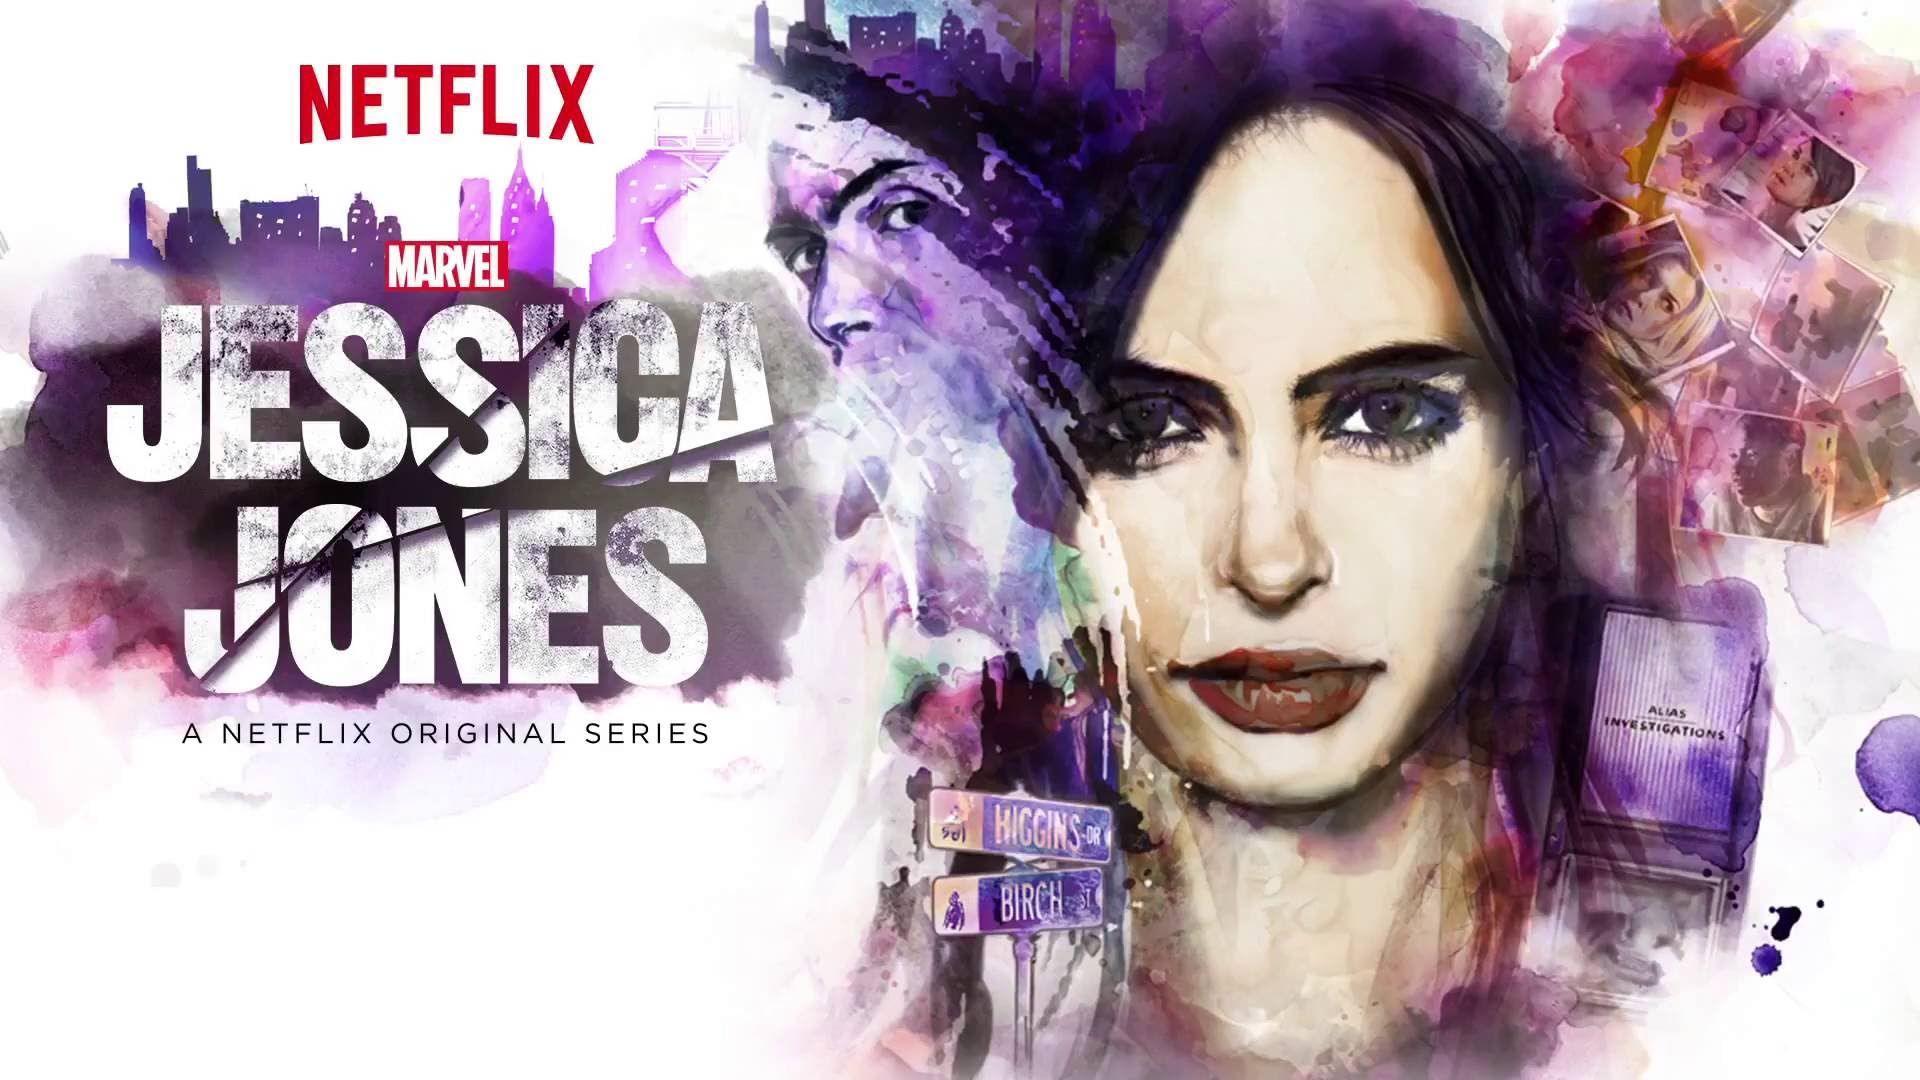 Jessica Jones Season 2 Wallpapers Wallpaper Cave